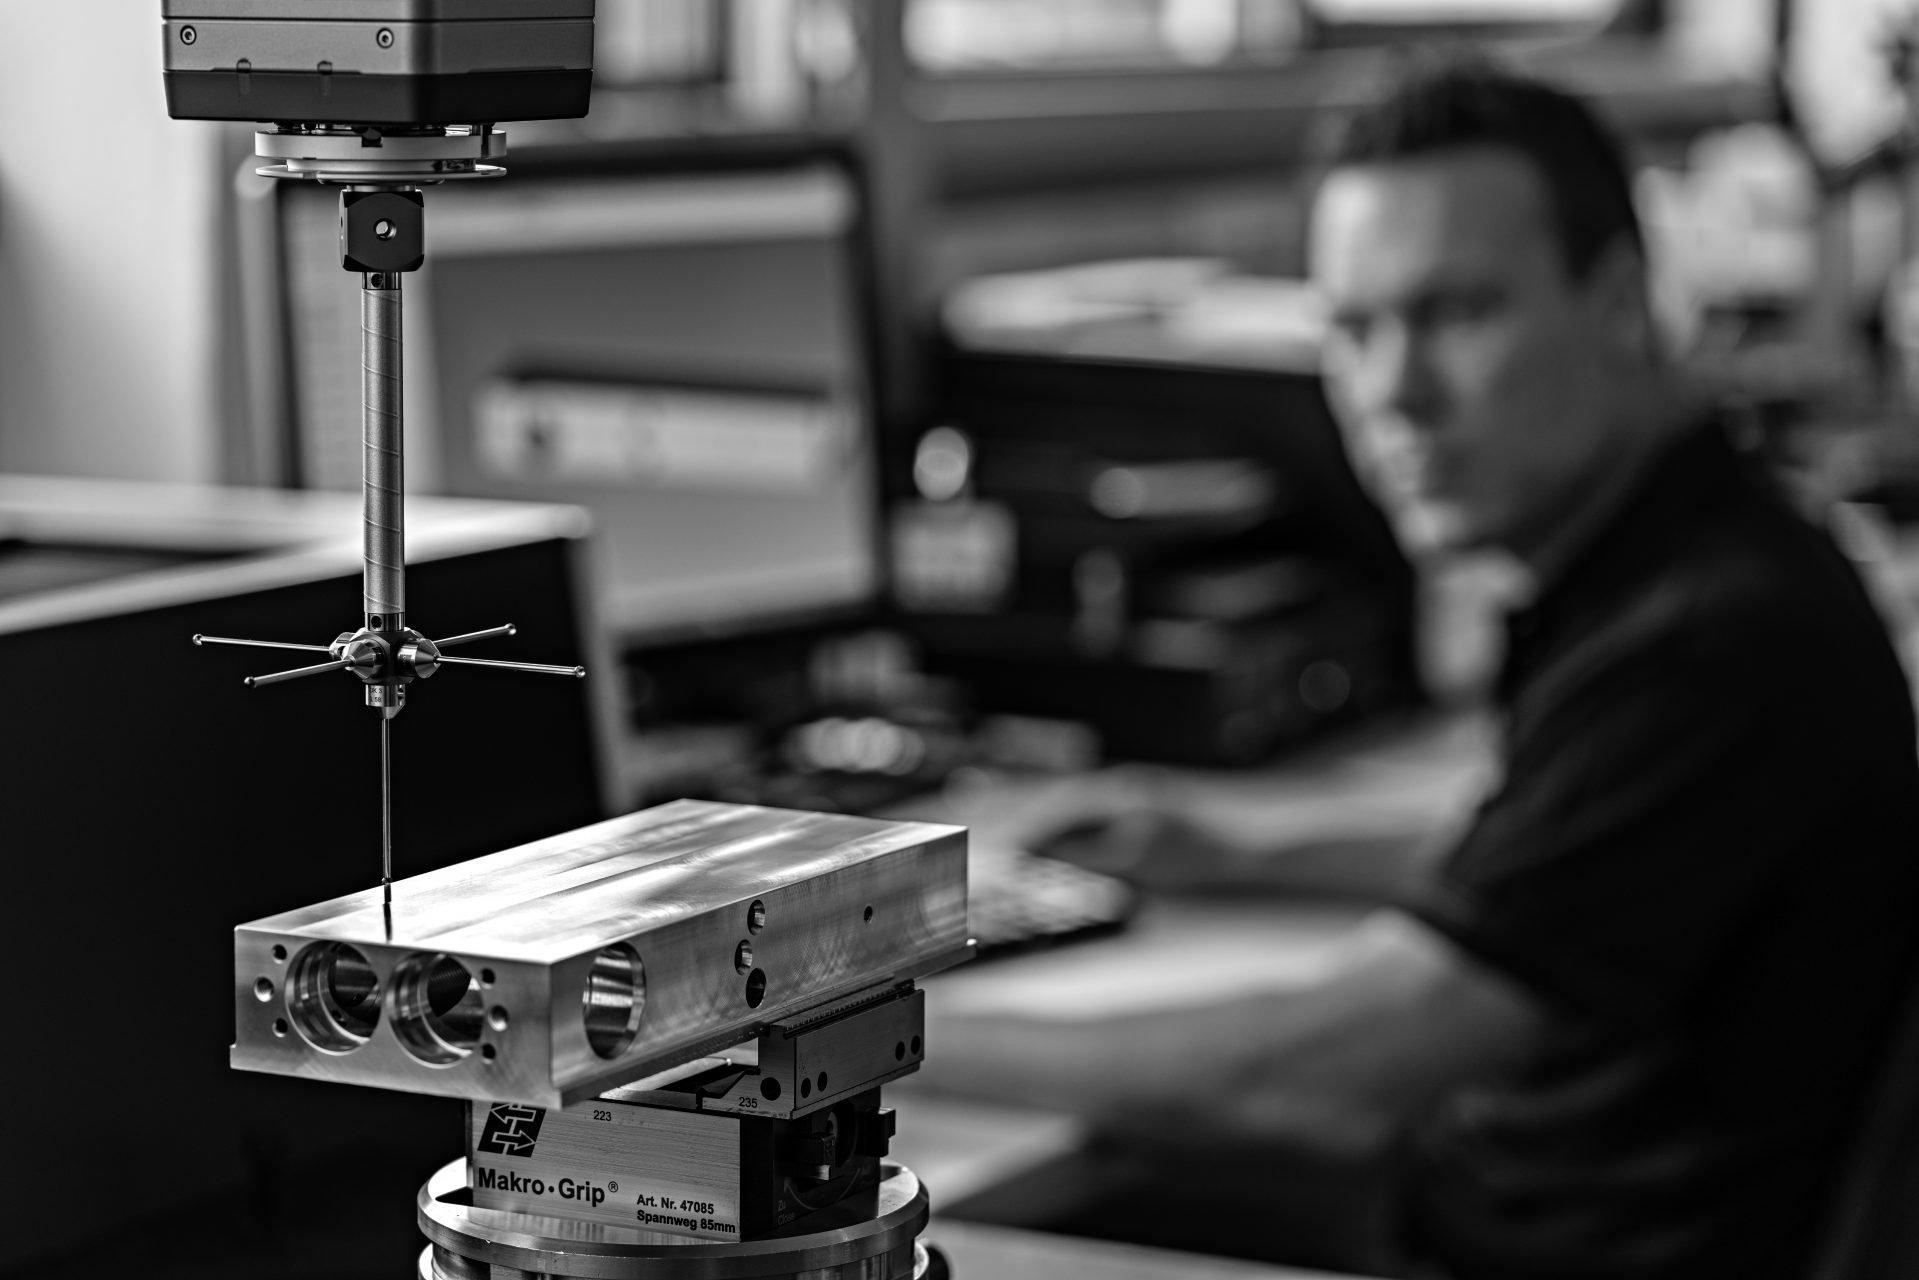 pivot-tur-scharnier-produktion-fritsjurgens.jpg